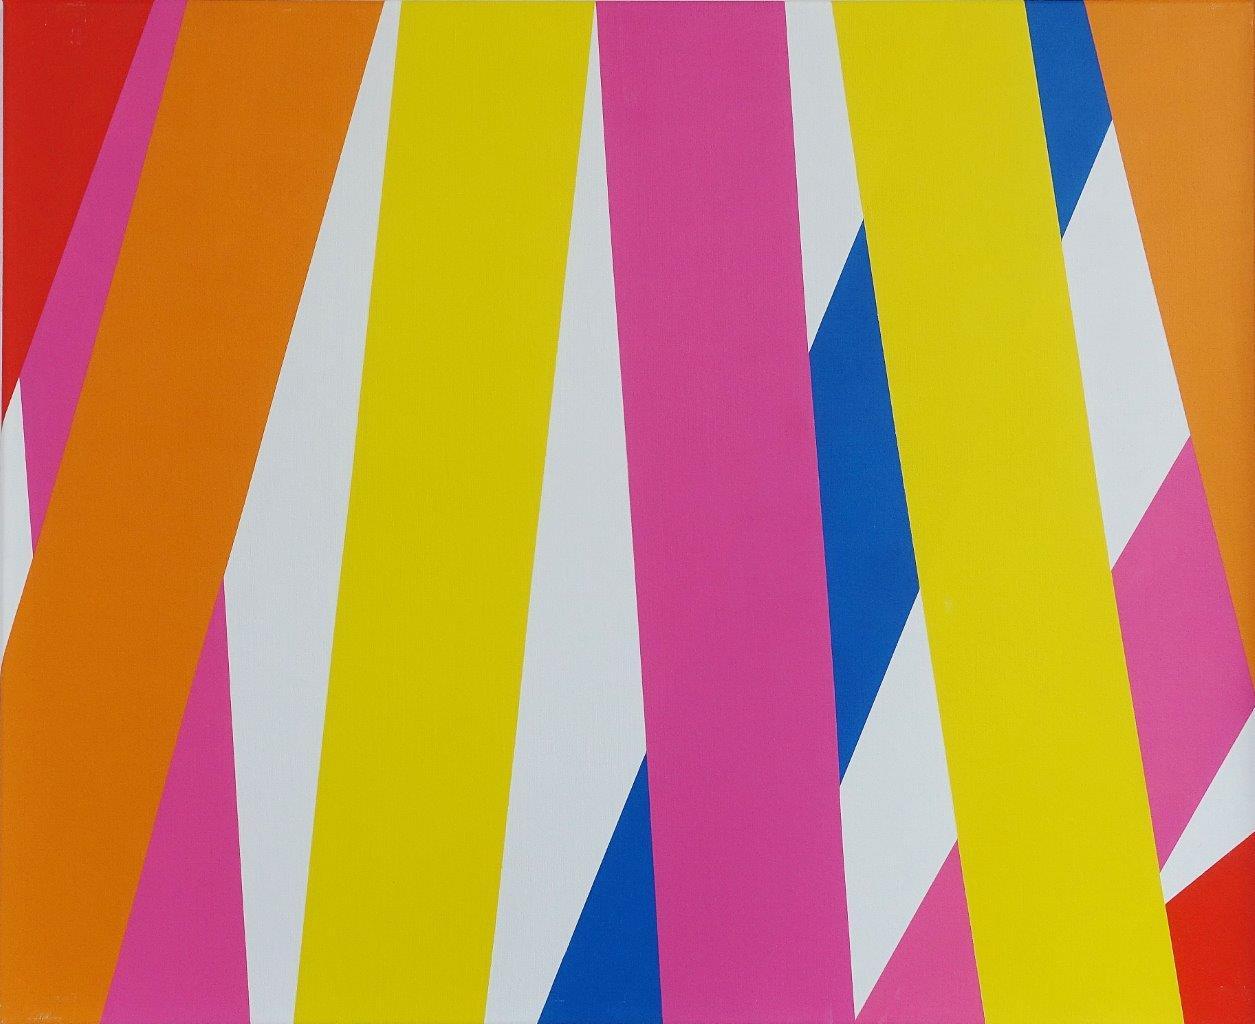 Joanna Stańko : Through pure colors